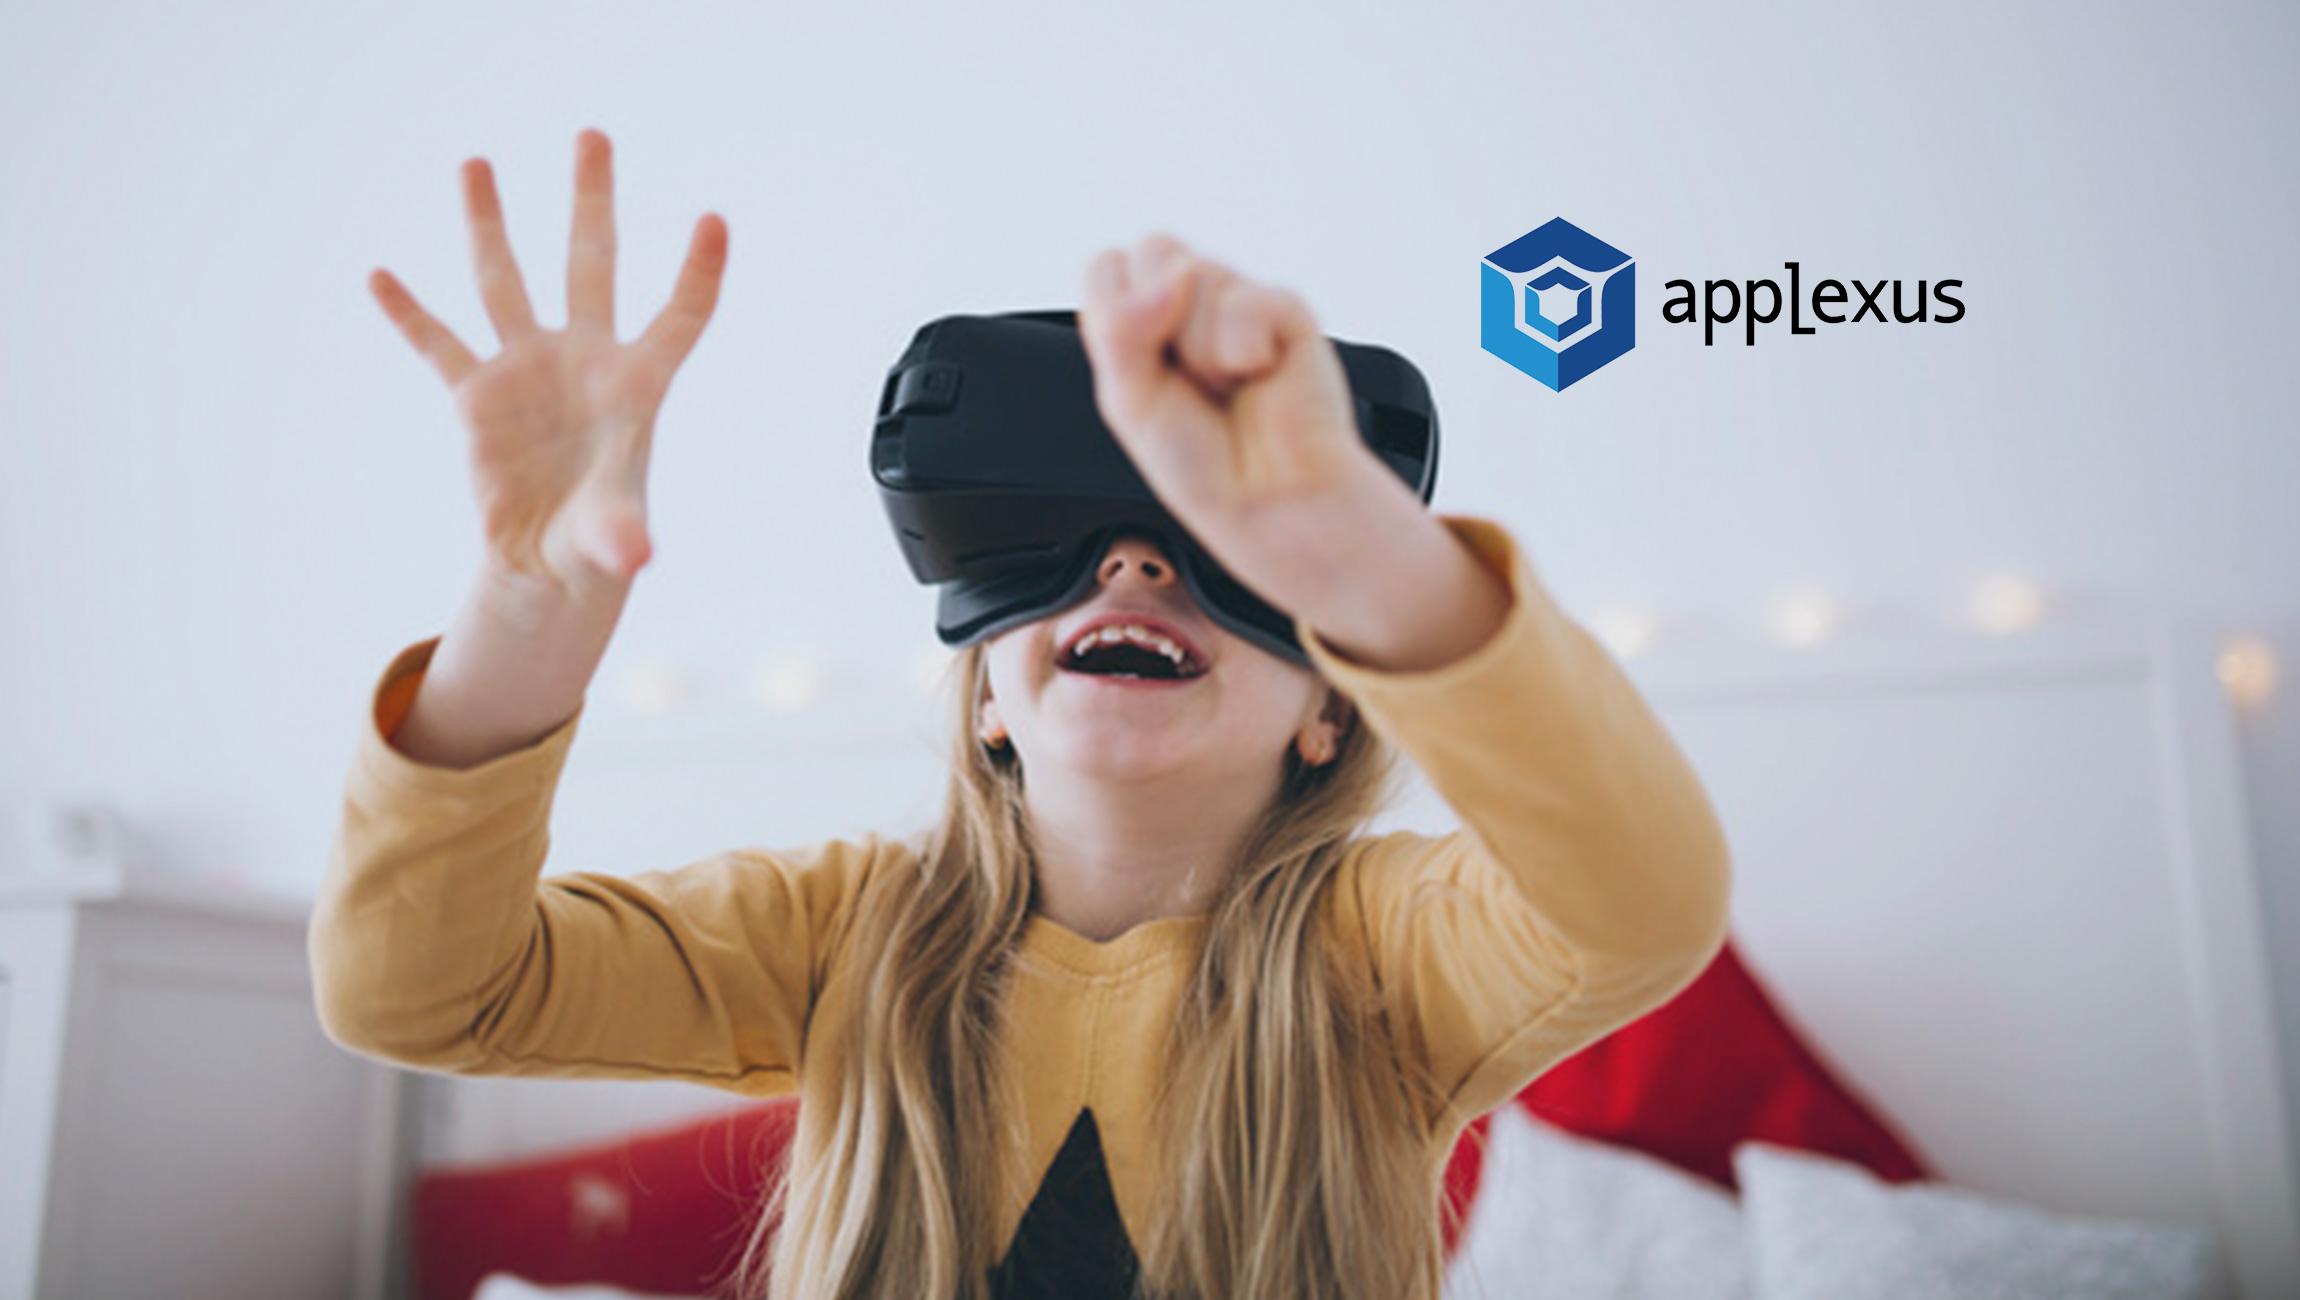 Applexus Technologies Expands Its Leadership Team